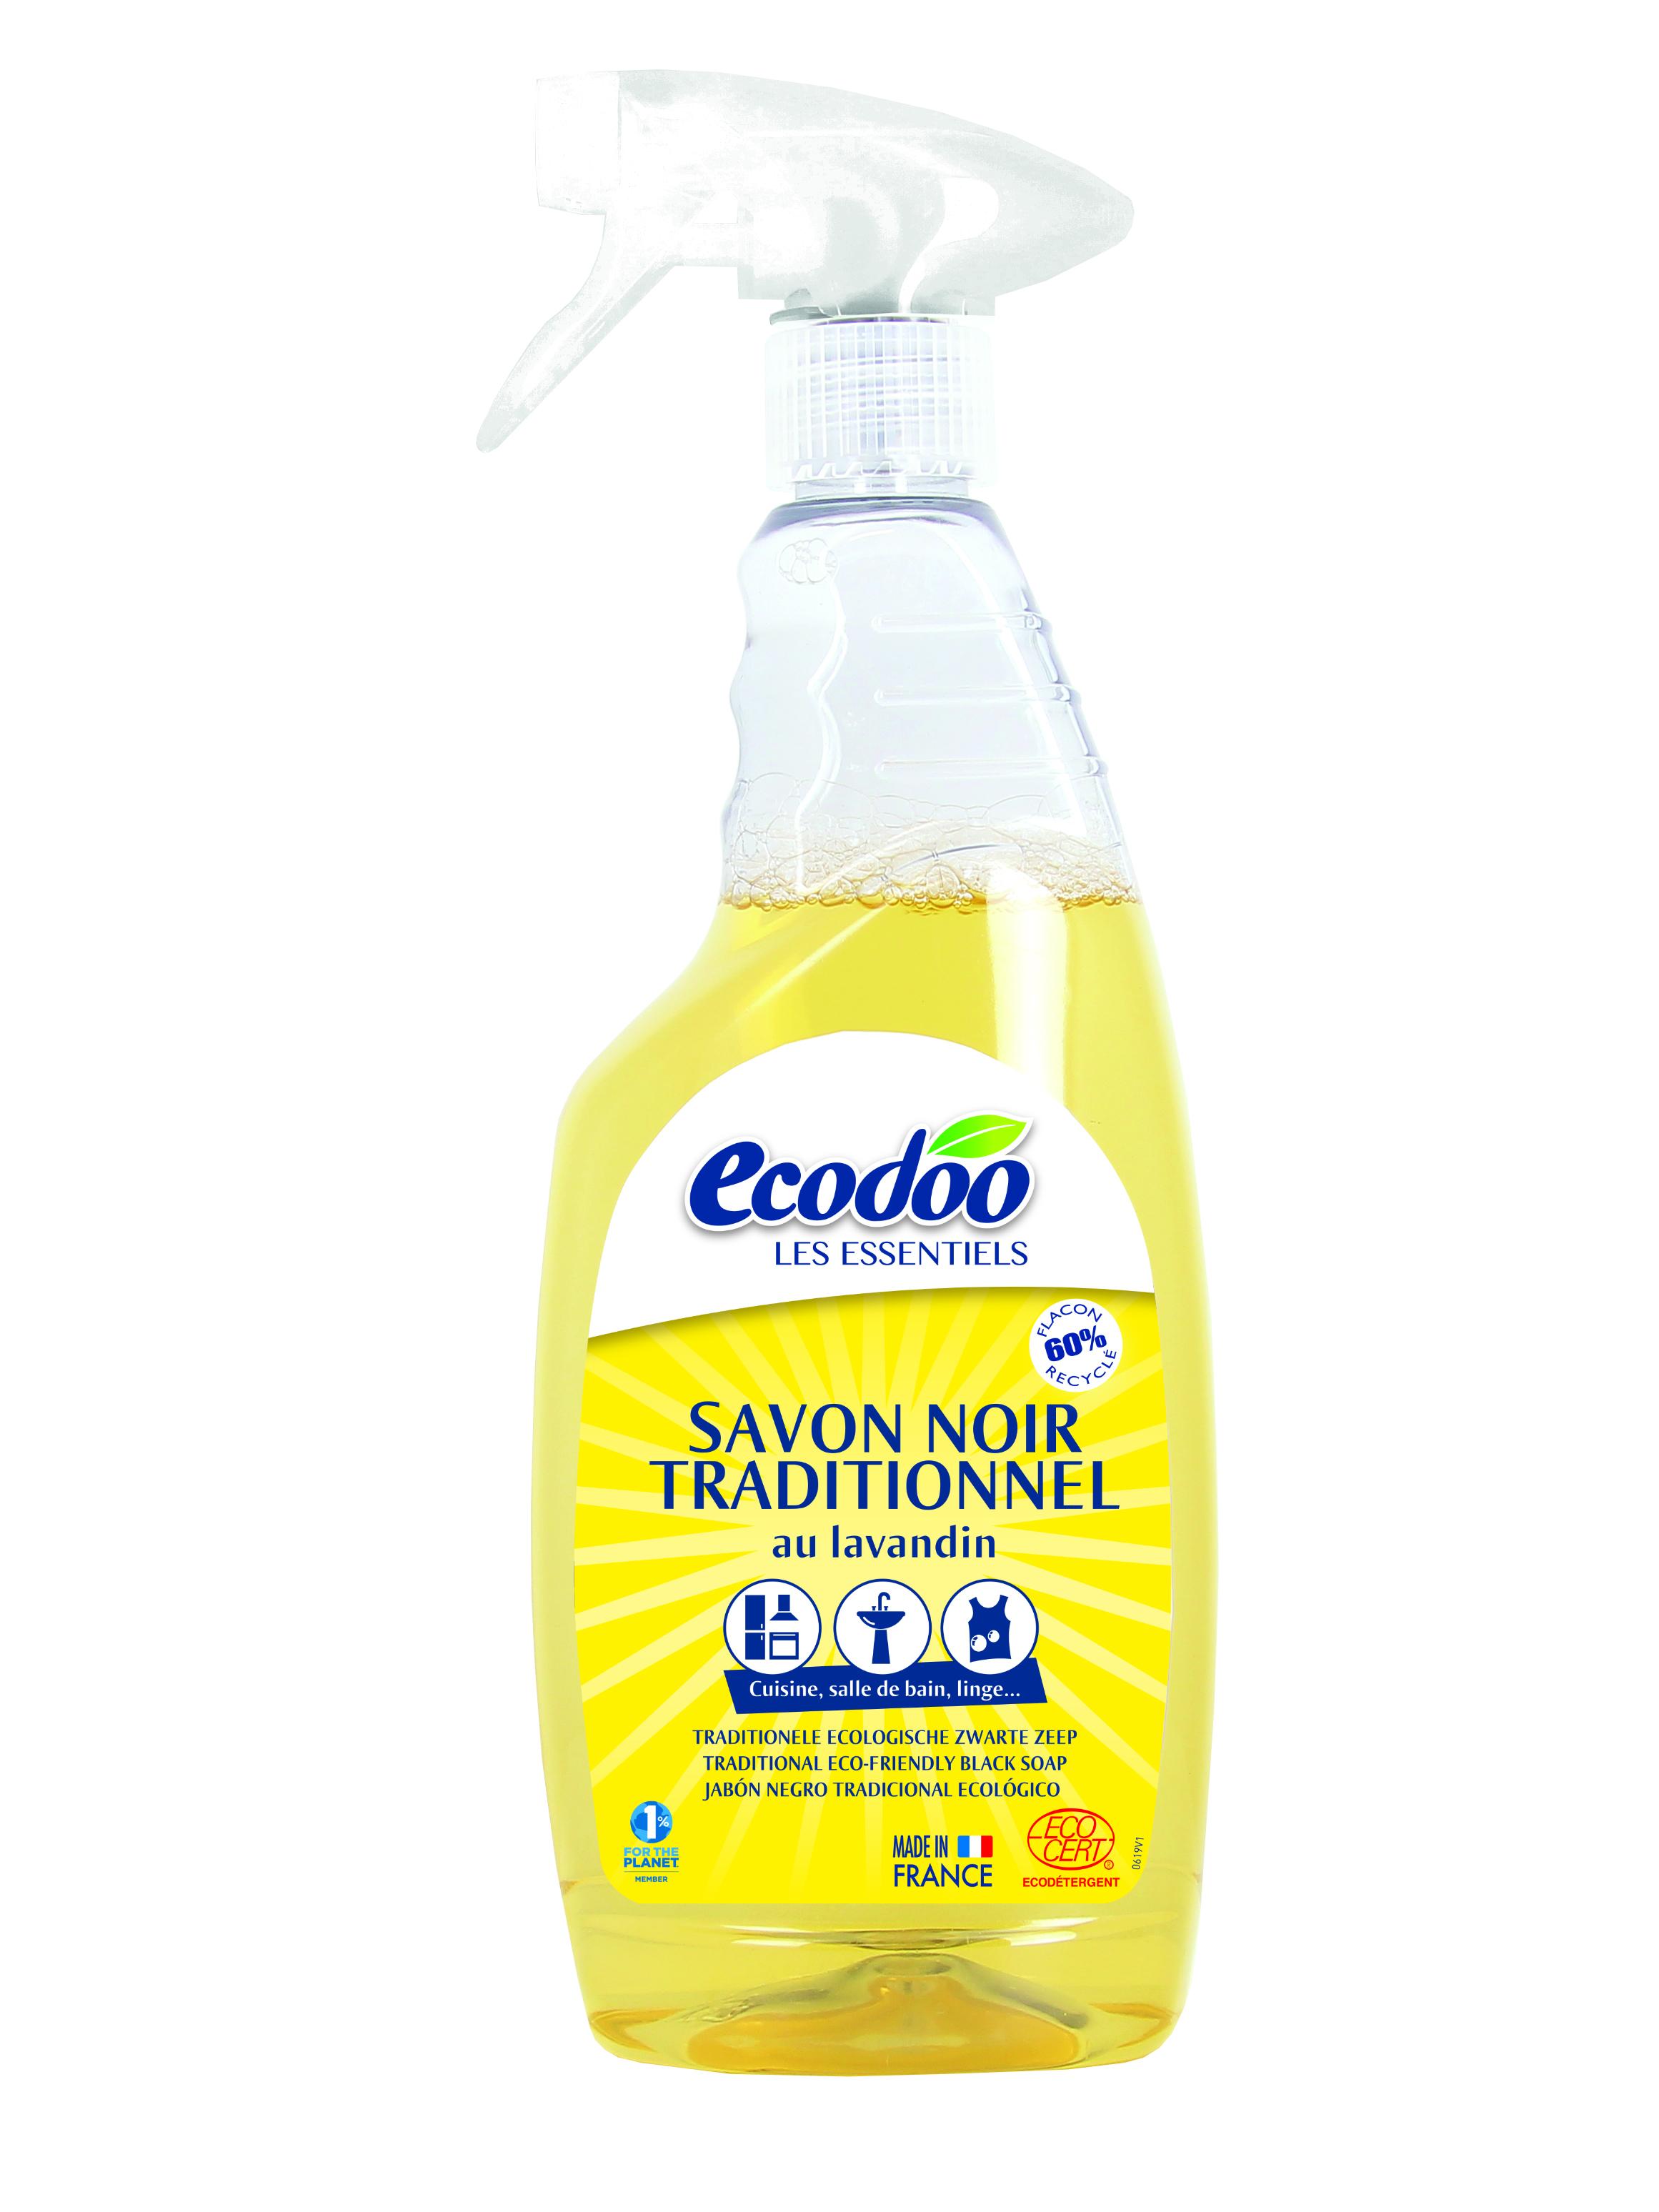 Ecodoo mustasaippuasuihke